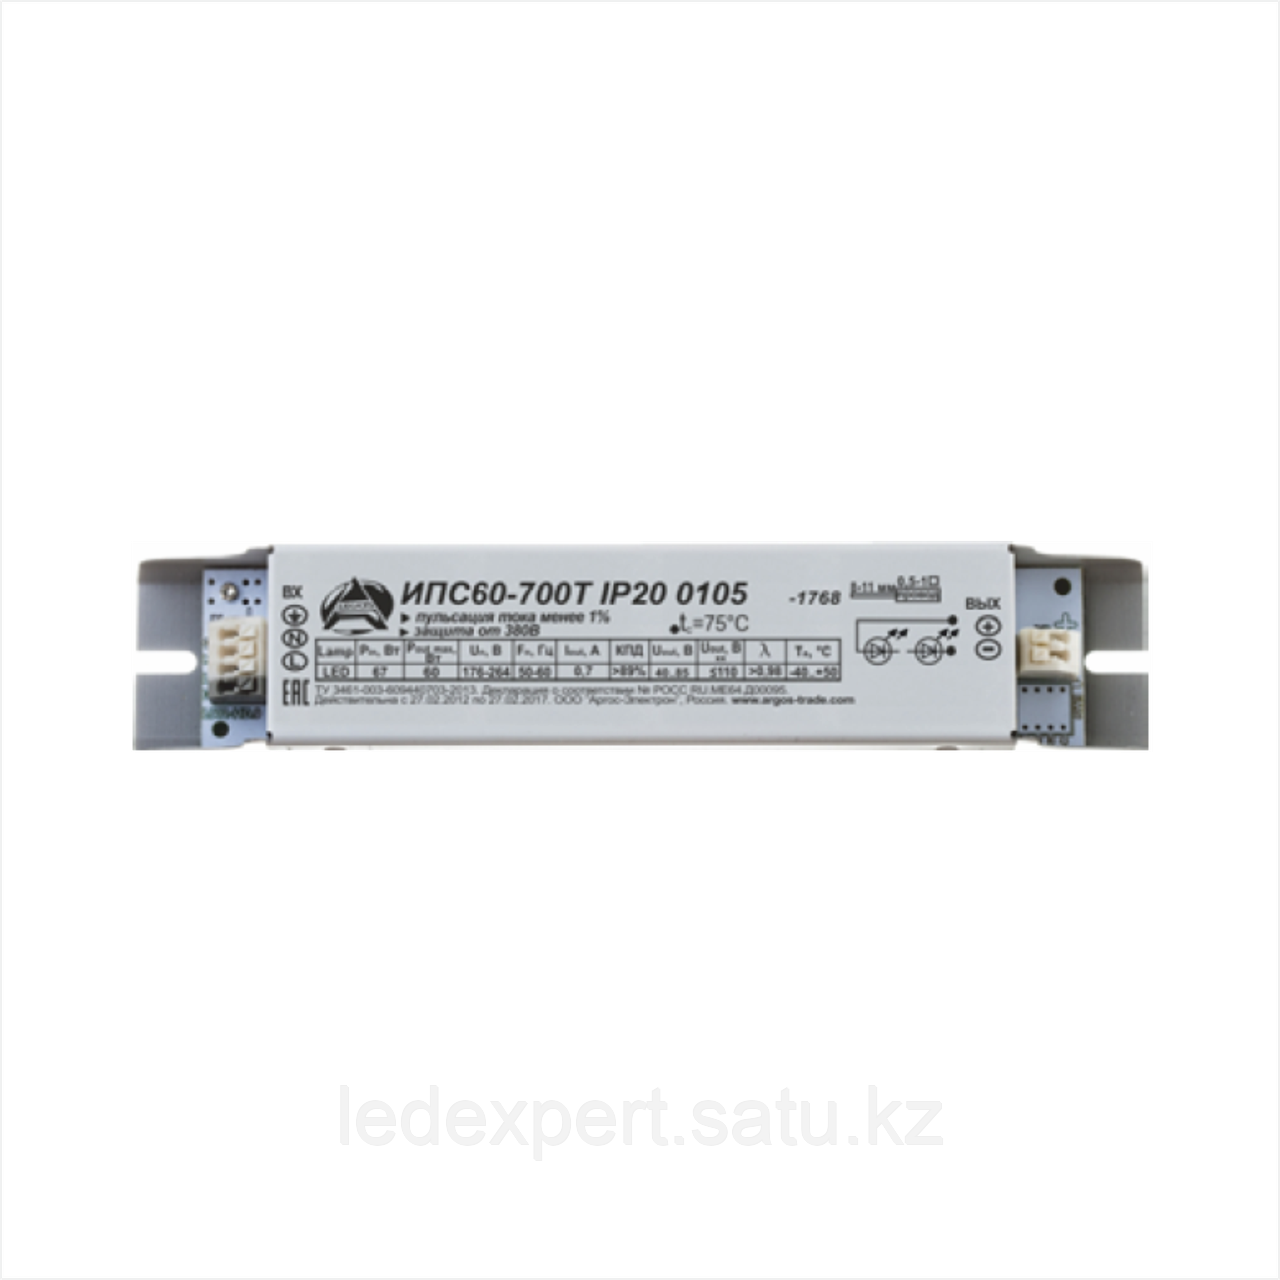 Источник питания Аргос ИПС60-700ТД(400-700) IP20 0100